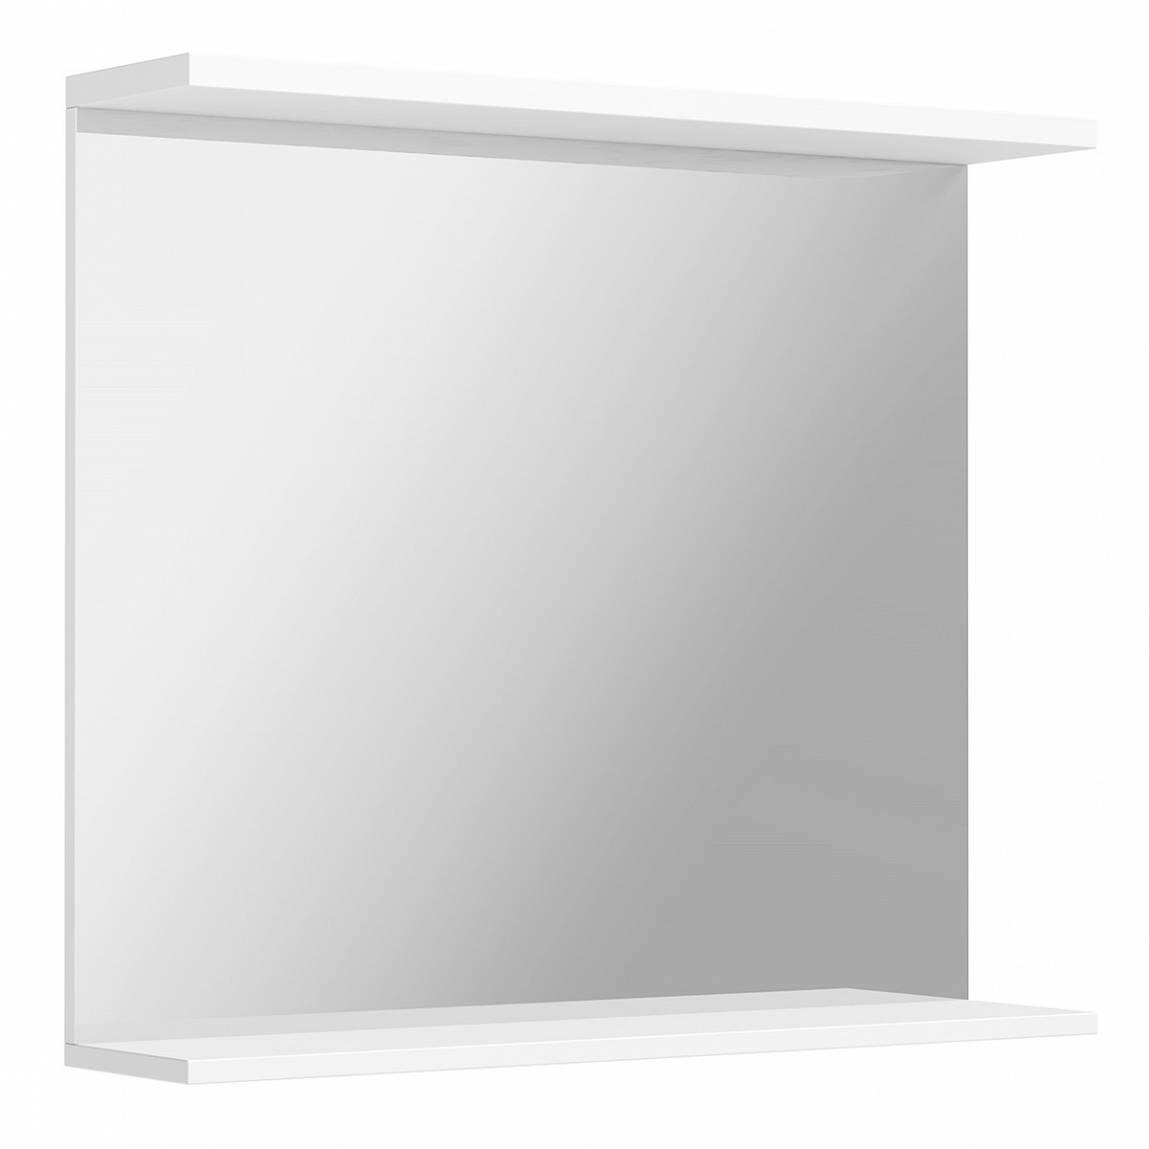 Image of Florence White 850 Mirror